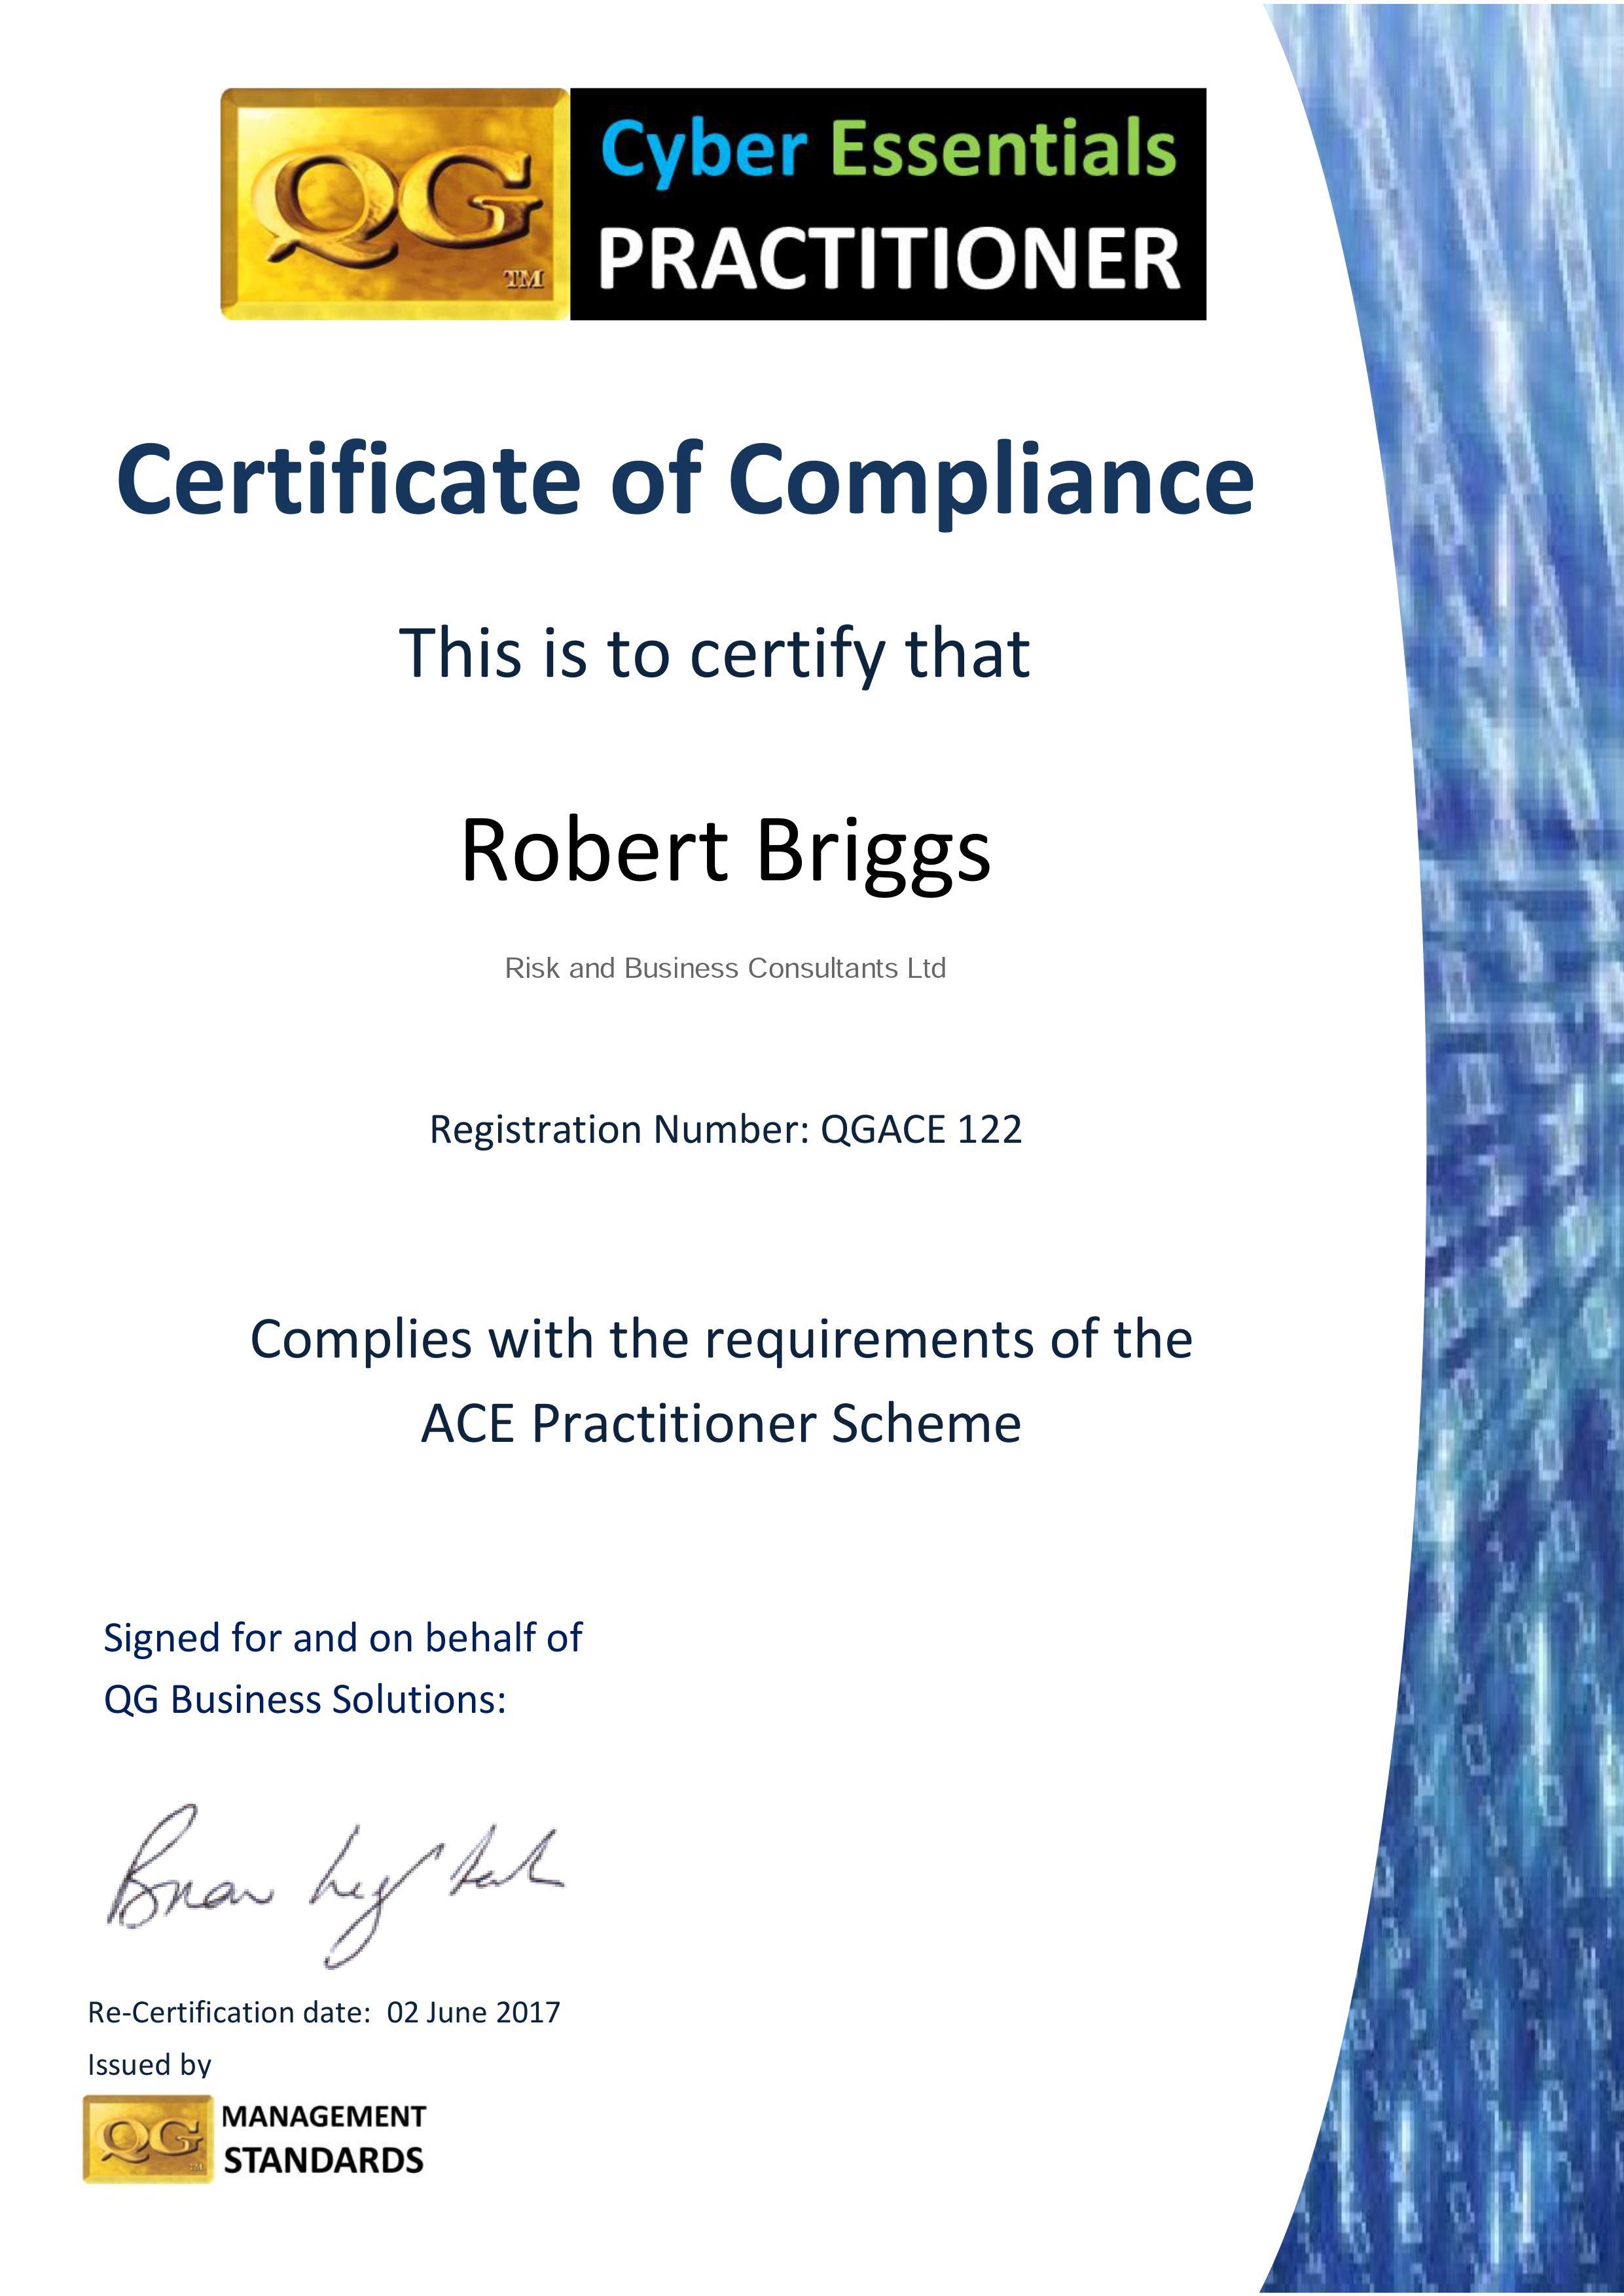 qgace122 16 17 Robert Briggs